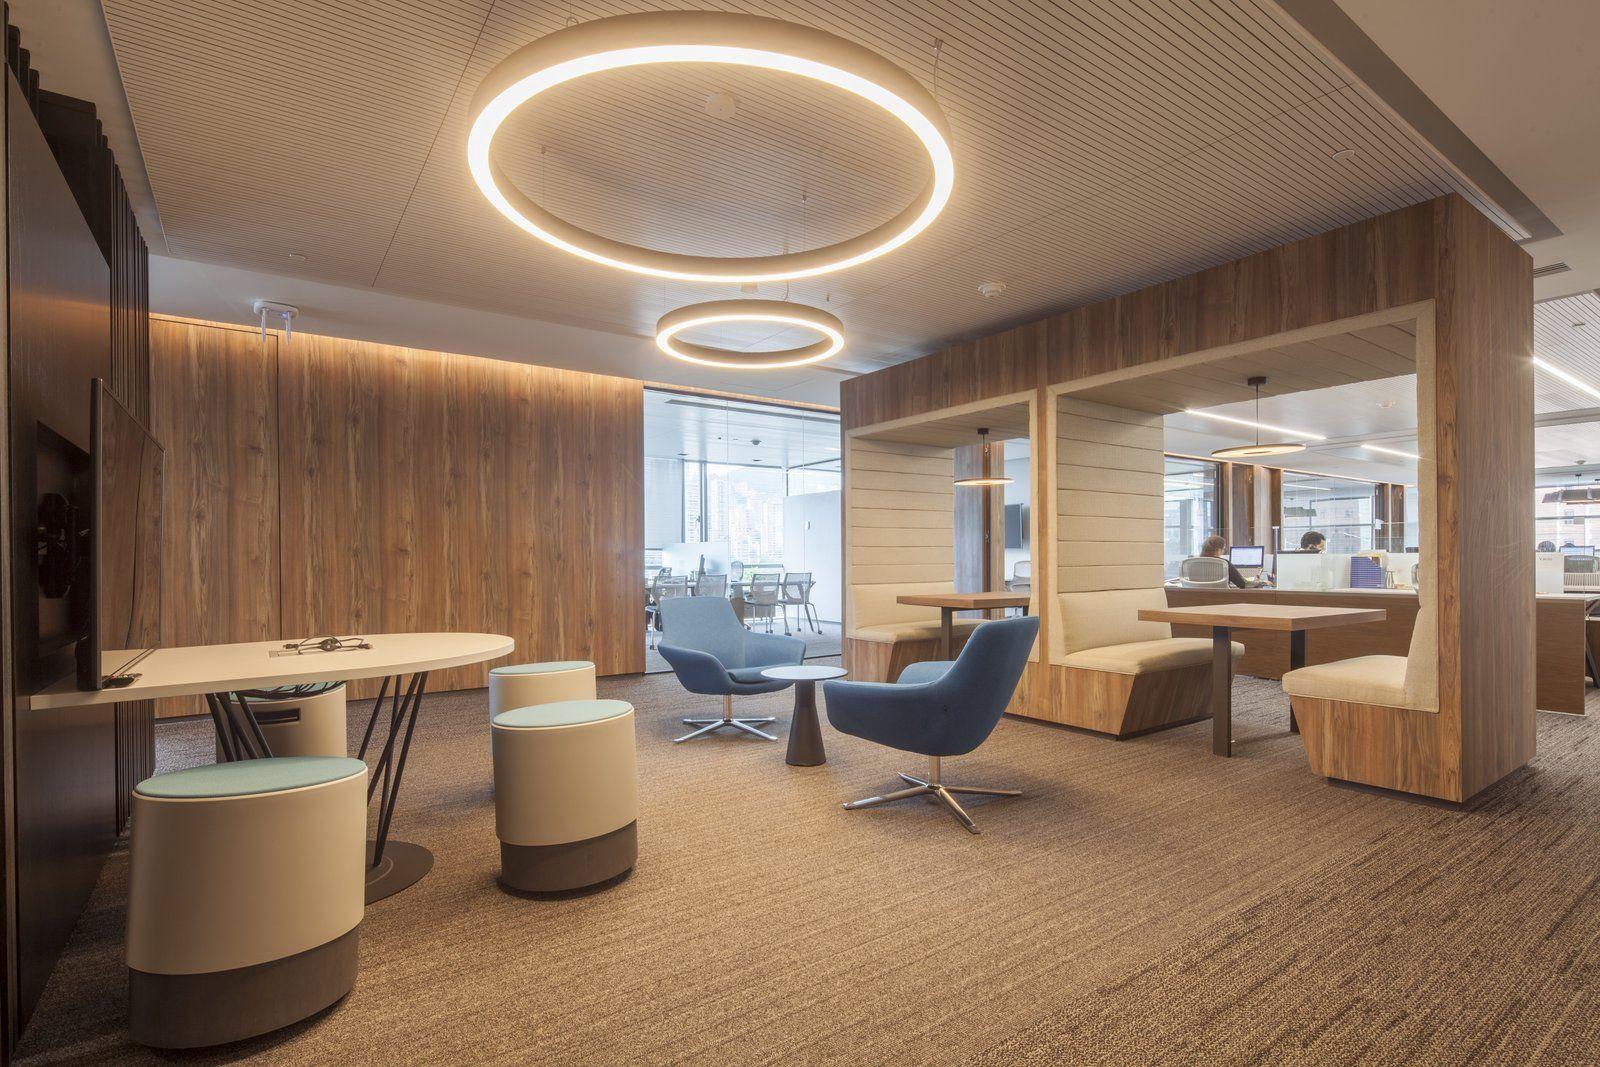 Tewes design nyc executive office seattle interior design - Udesign Mimarl K Ofis Projeleri Office Caffe Shop Pinterest Office Designs Desks And Living Rooms